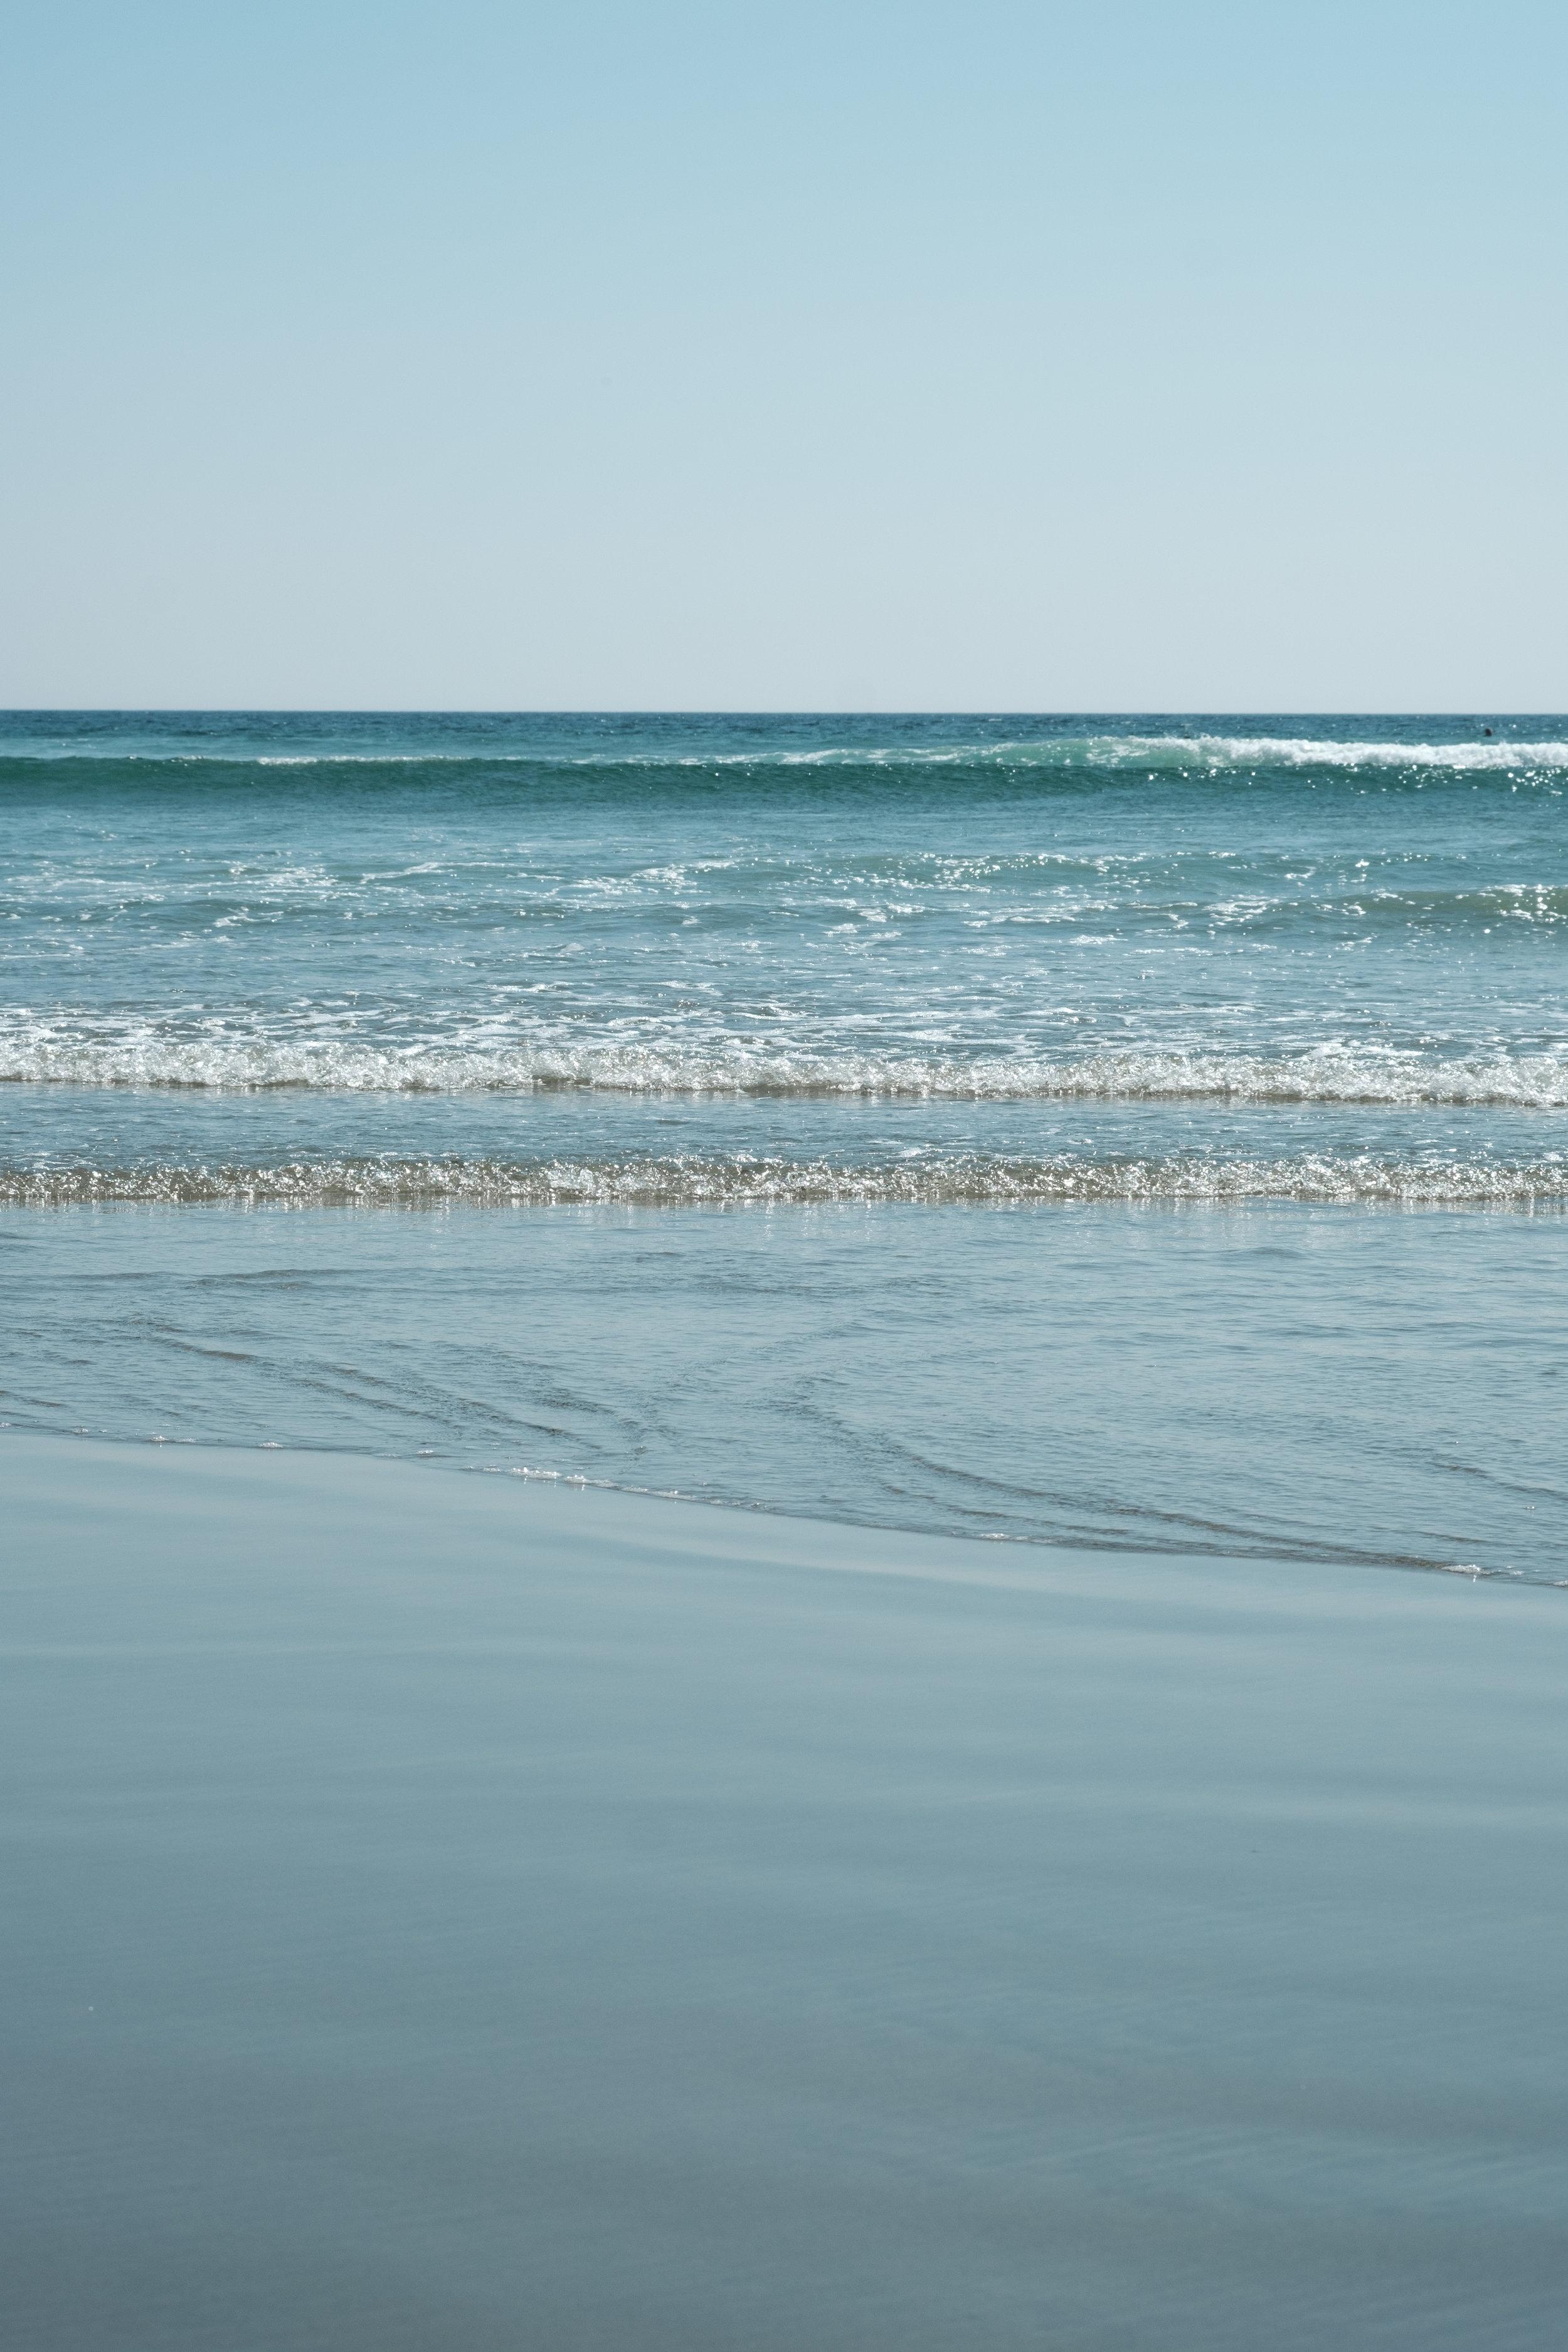 Peaceful ocean waves rolling in at Long Beach, Tofino